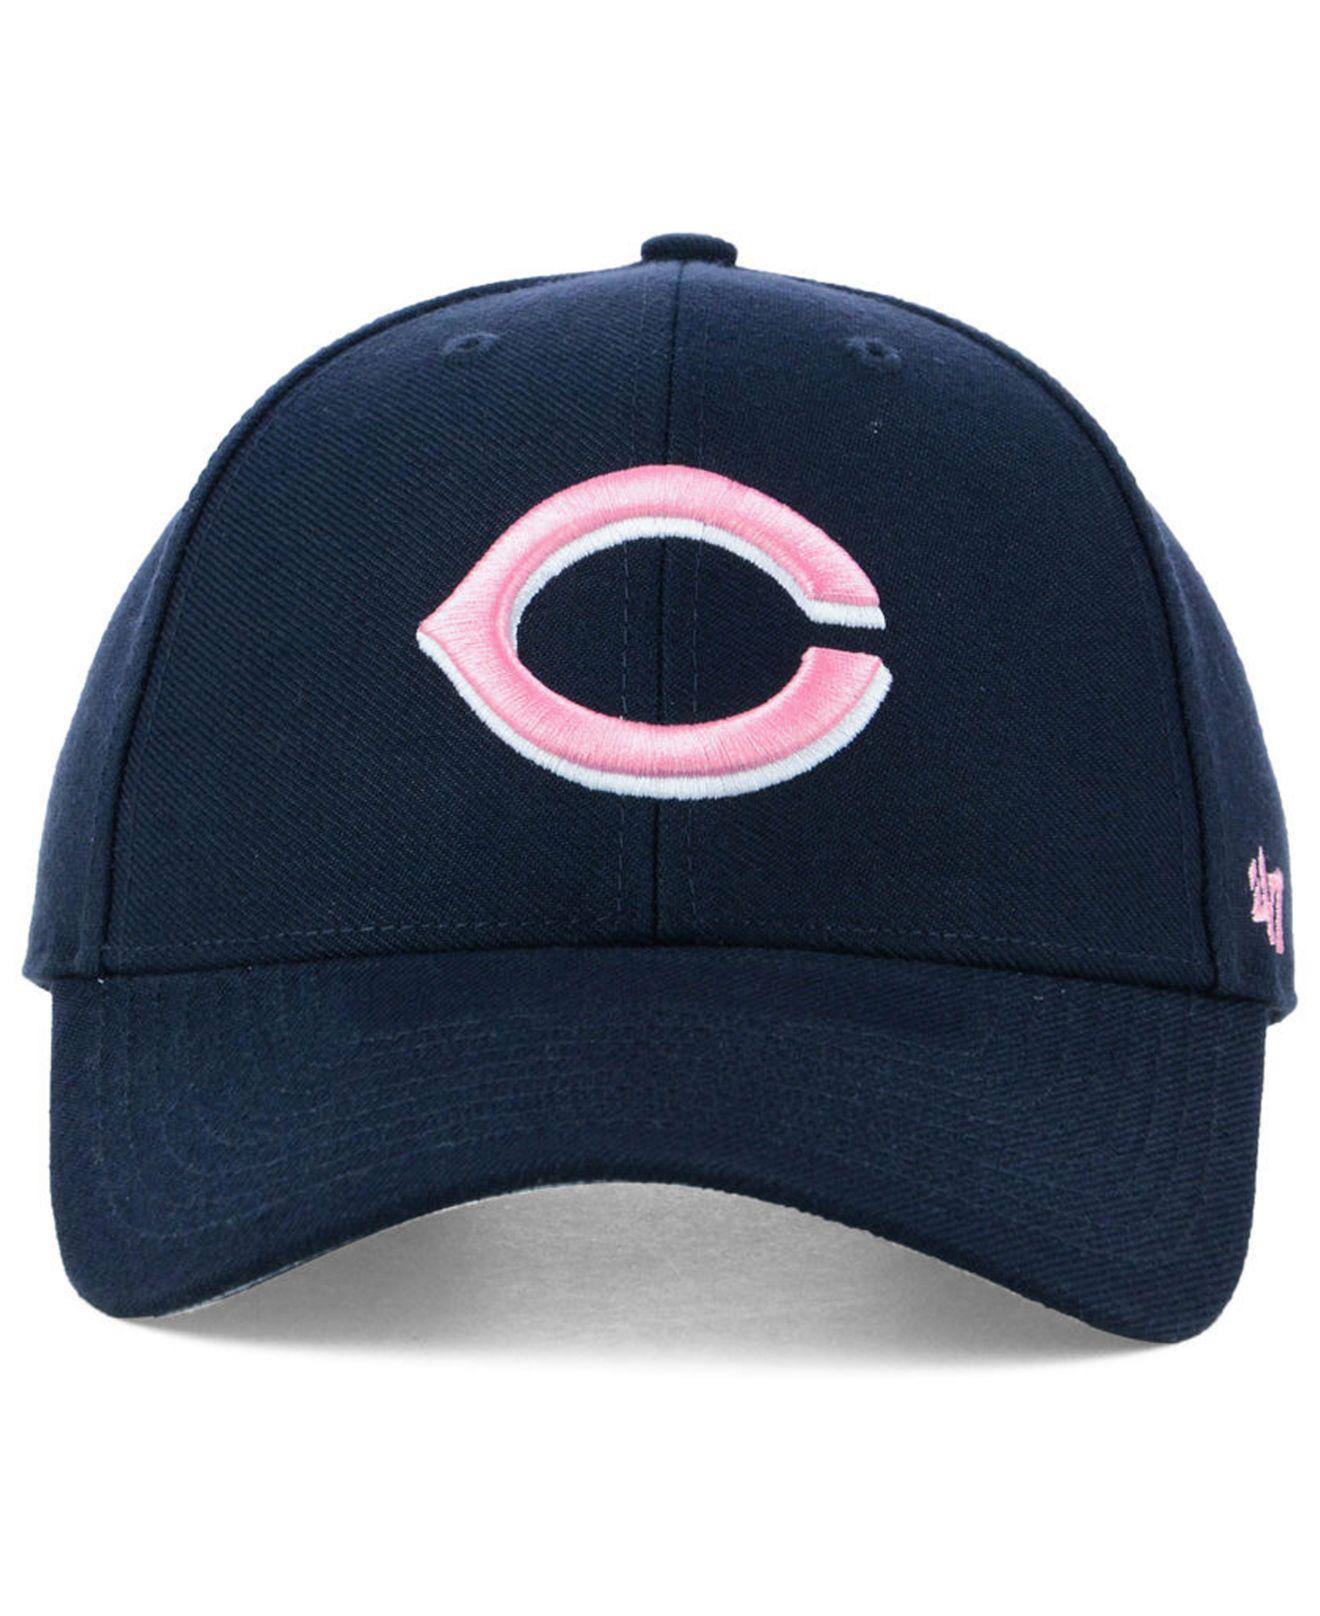 new product 8f5e6 34a96 ... usa lyst 47 brand cincinnati reds navy pink mvp cap in blue for men  4272e 07a89